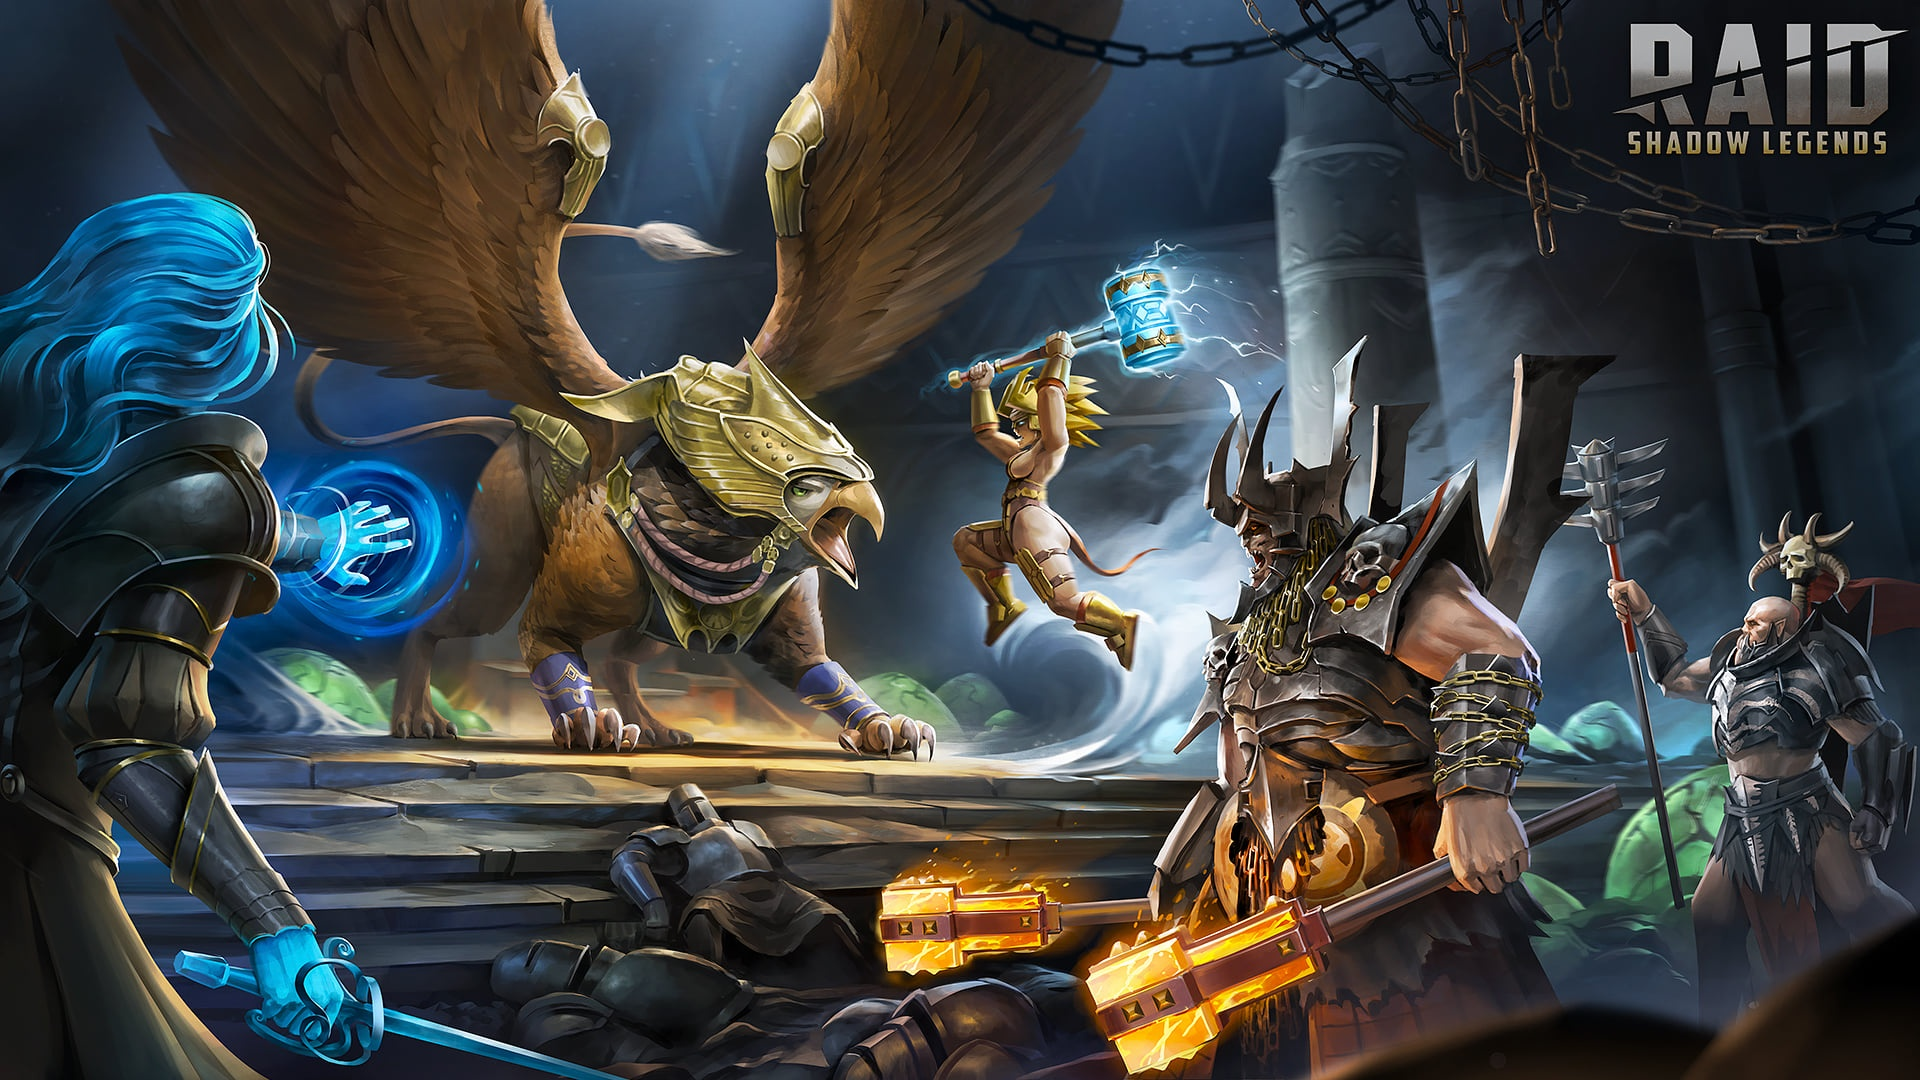 Raid Shadow Legends 1920x1080 wallpaper